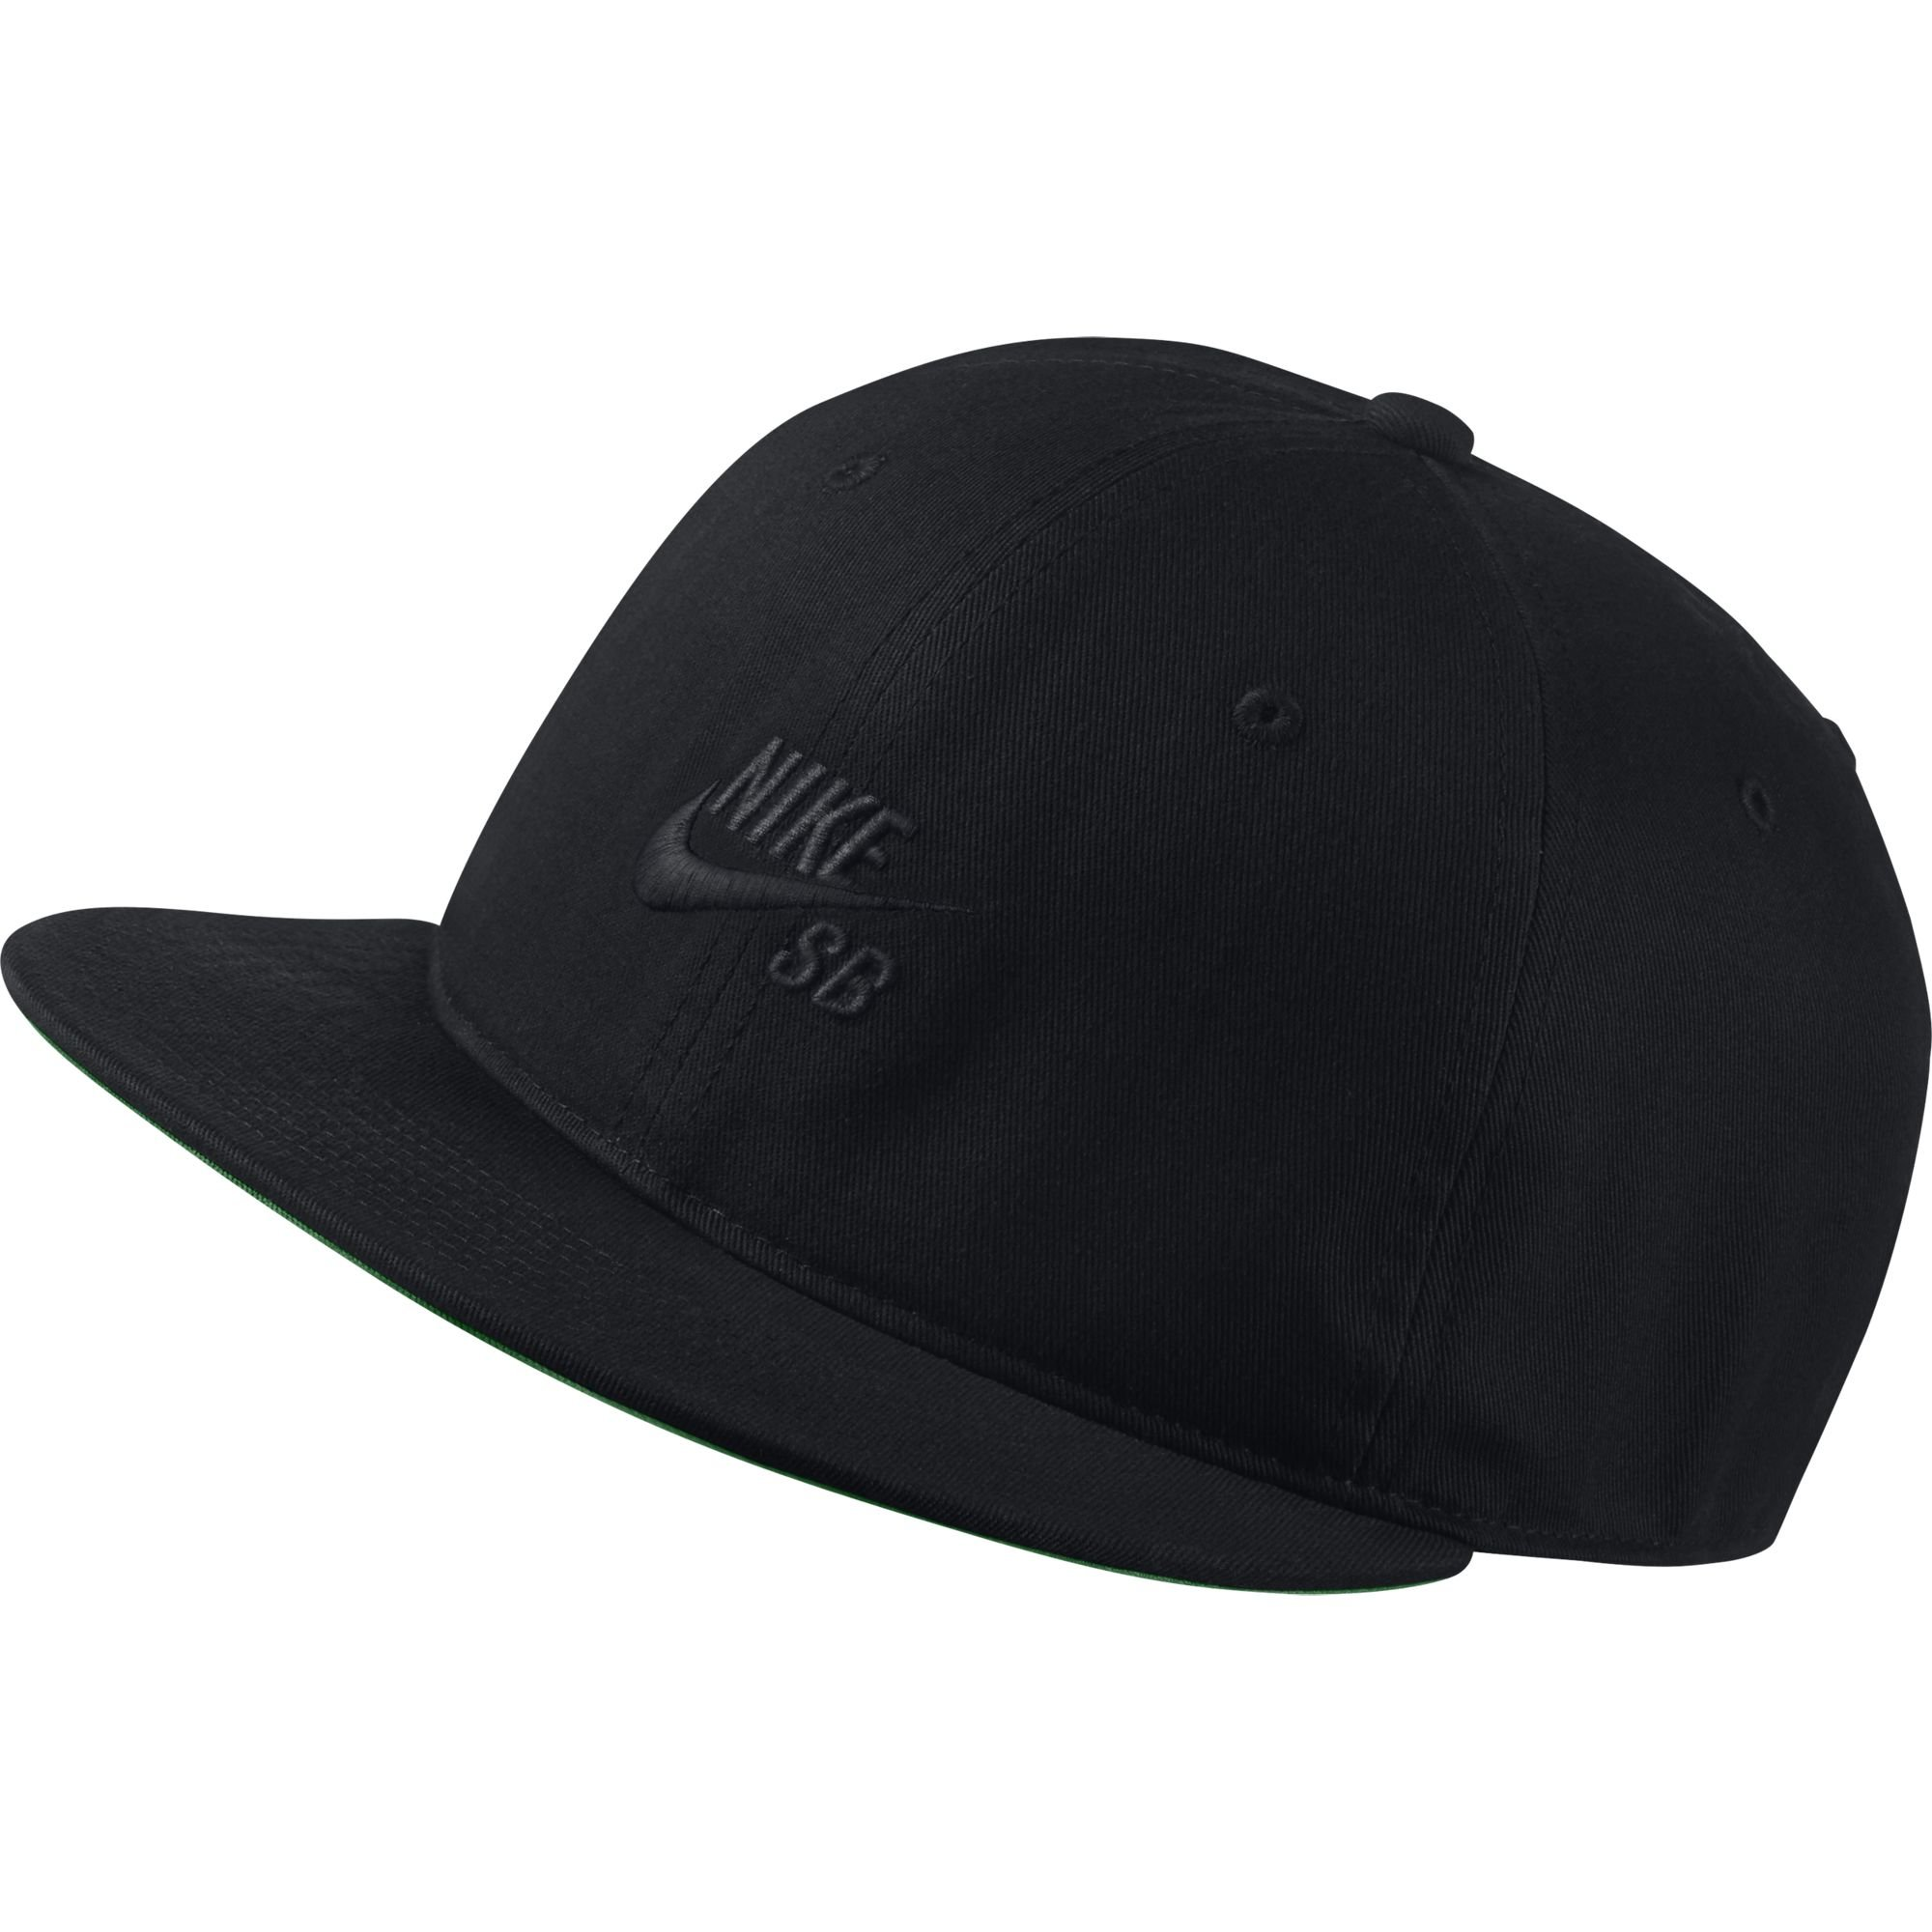 dc1f7b47fd6 Galleon - Nike SB Pro Vintage Snapback Hat (Black Pine Green Black Black)